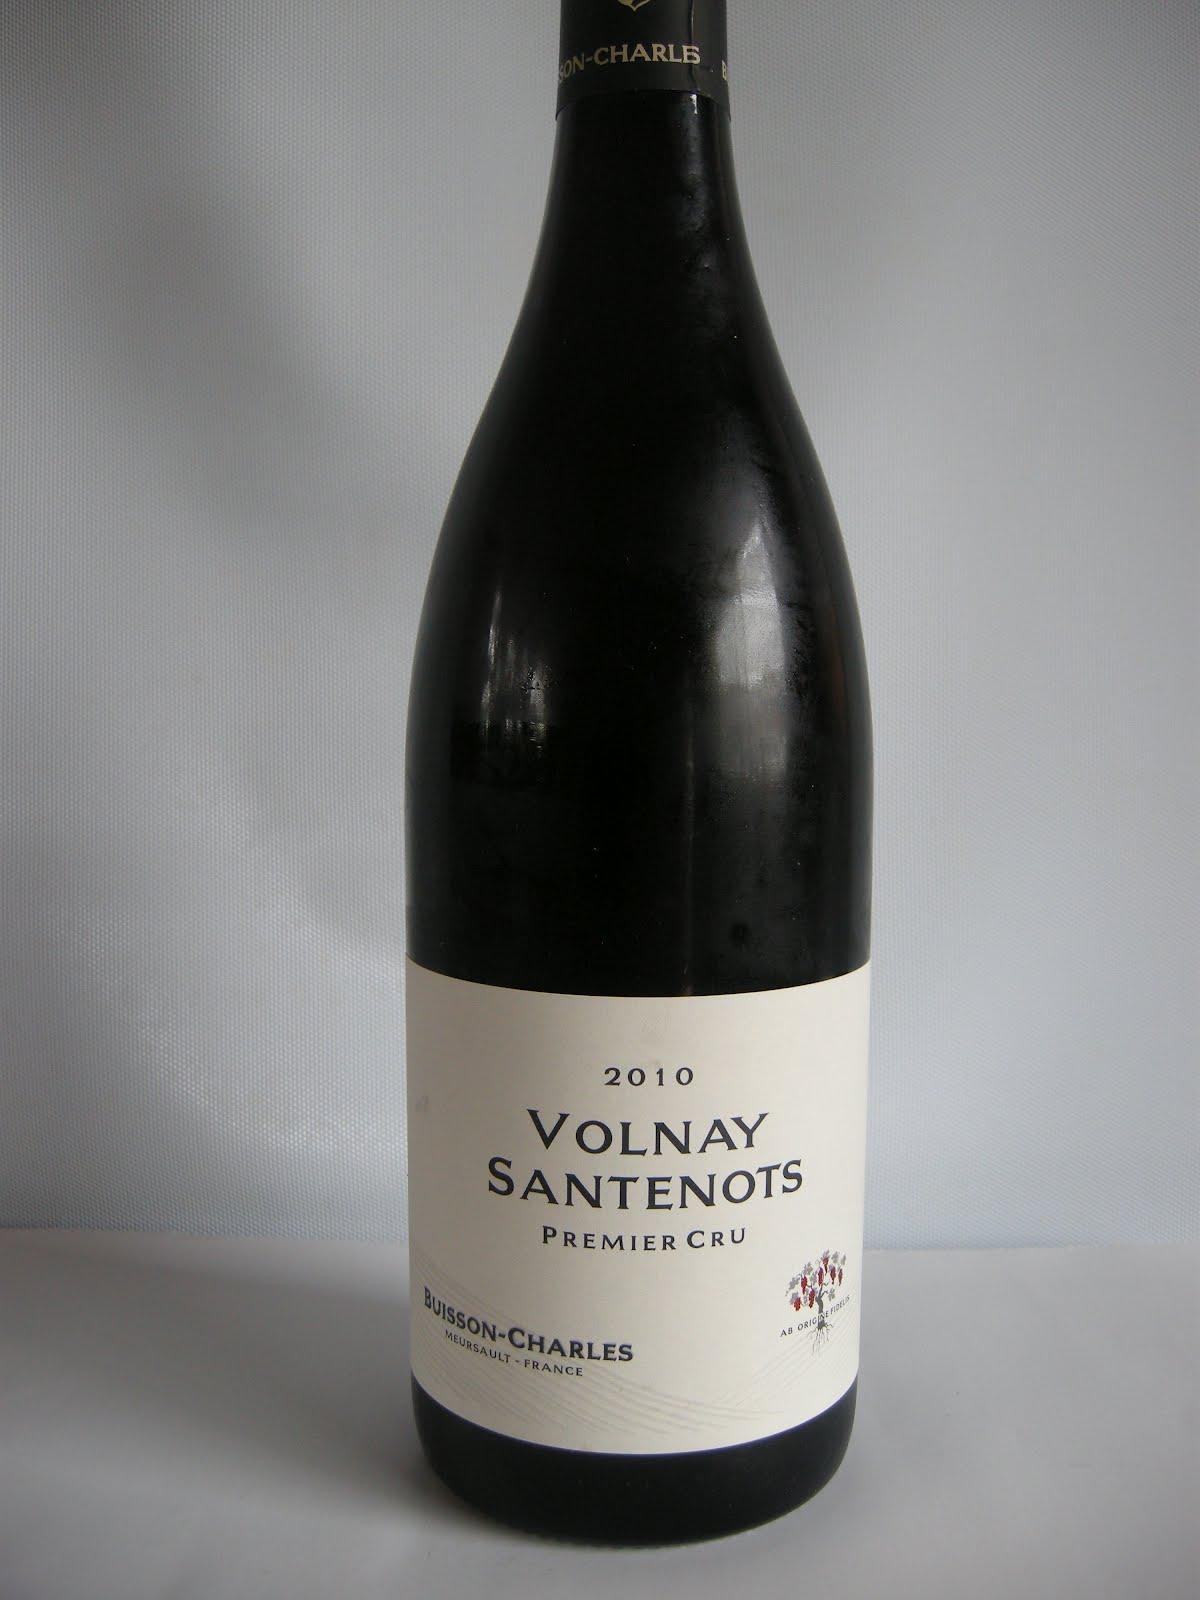 Volnay Santenots